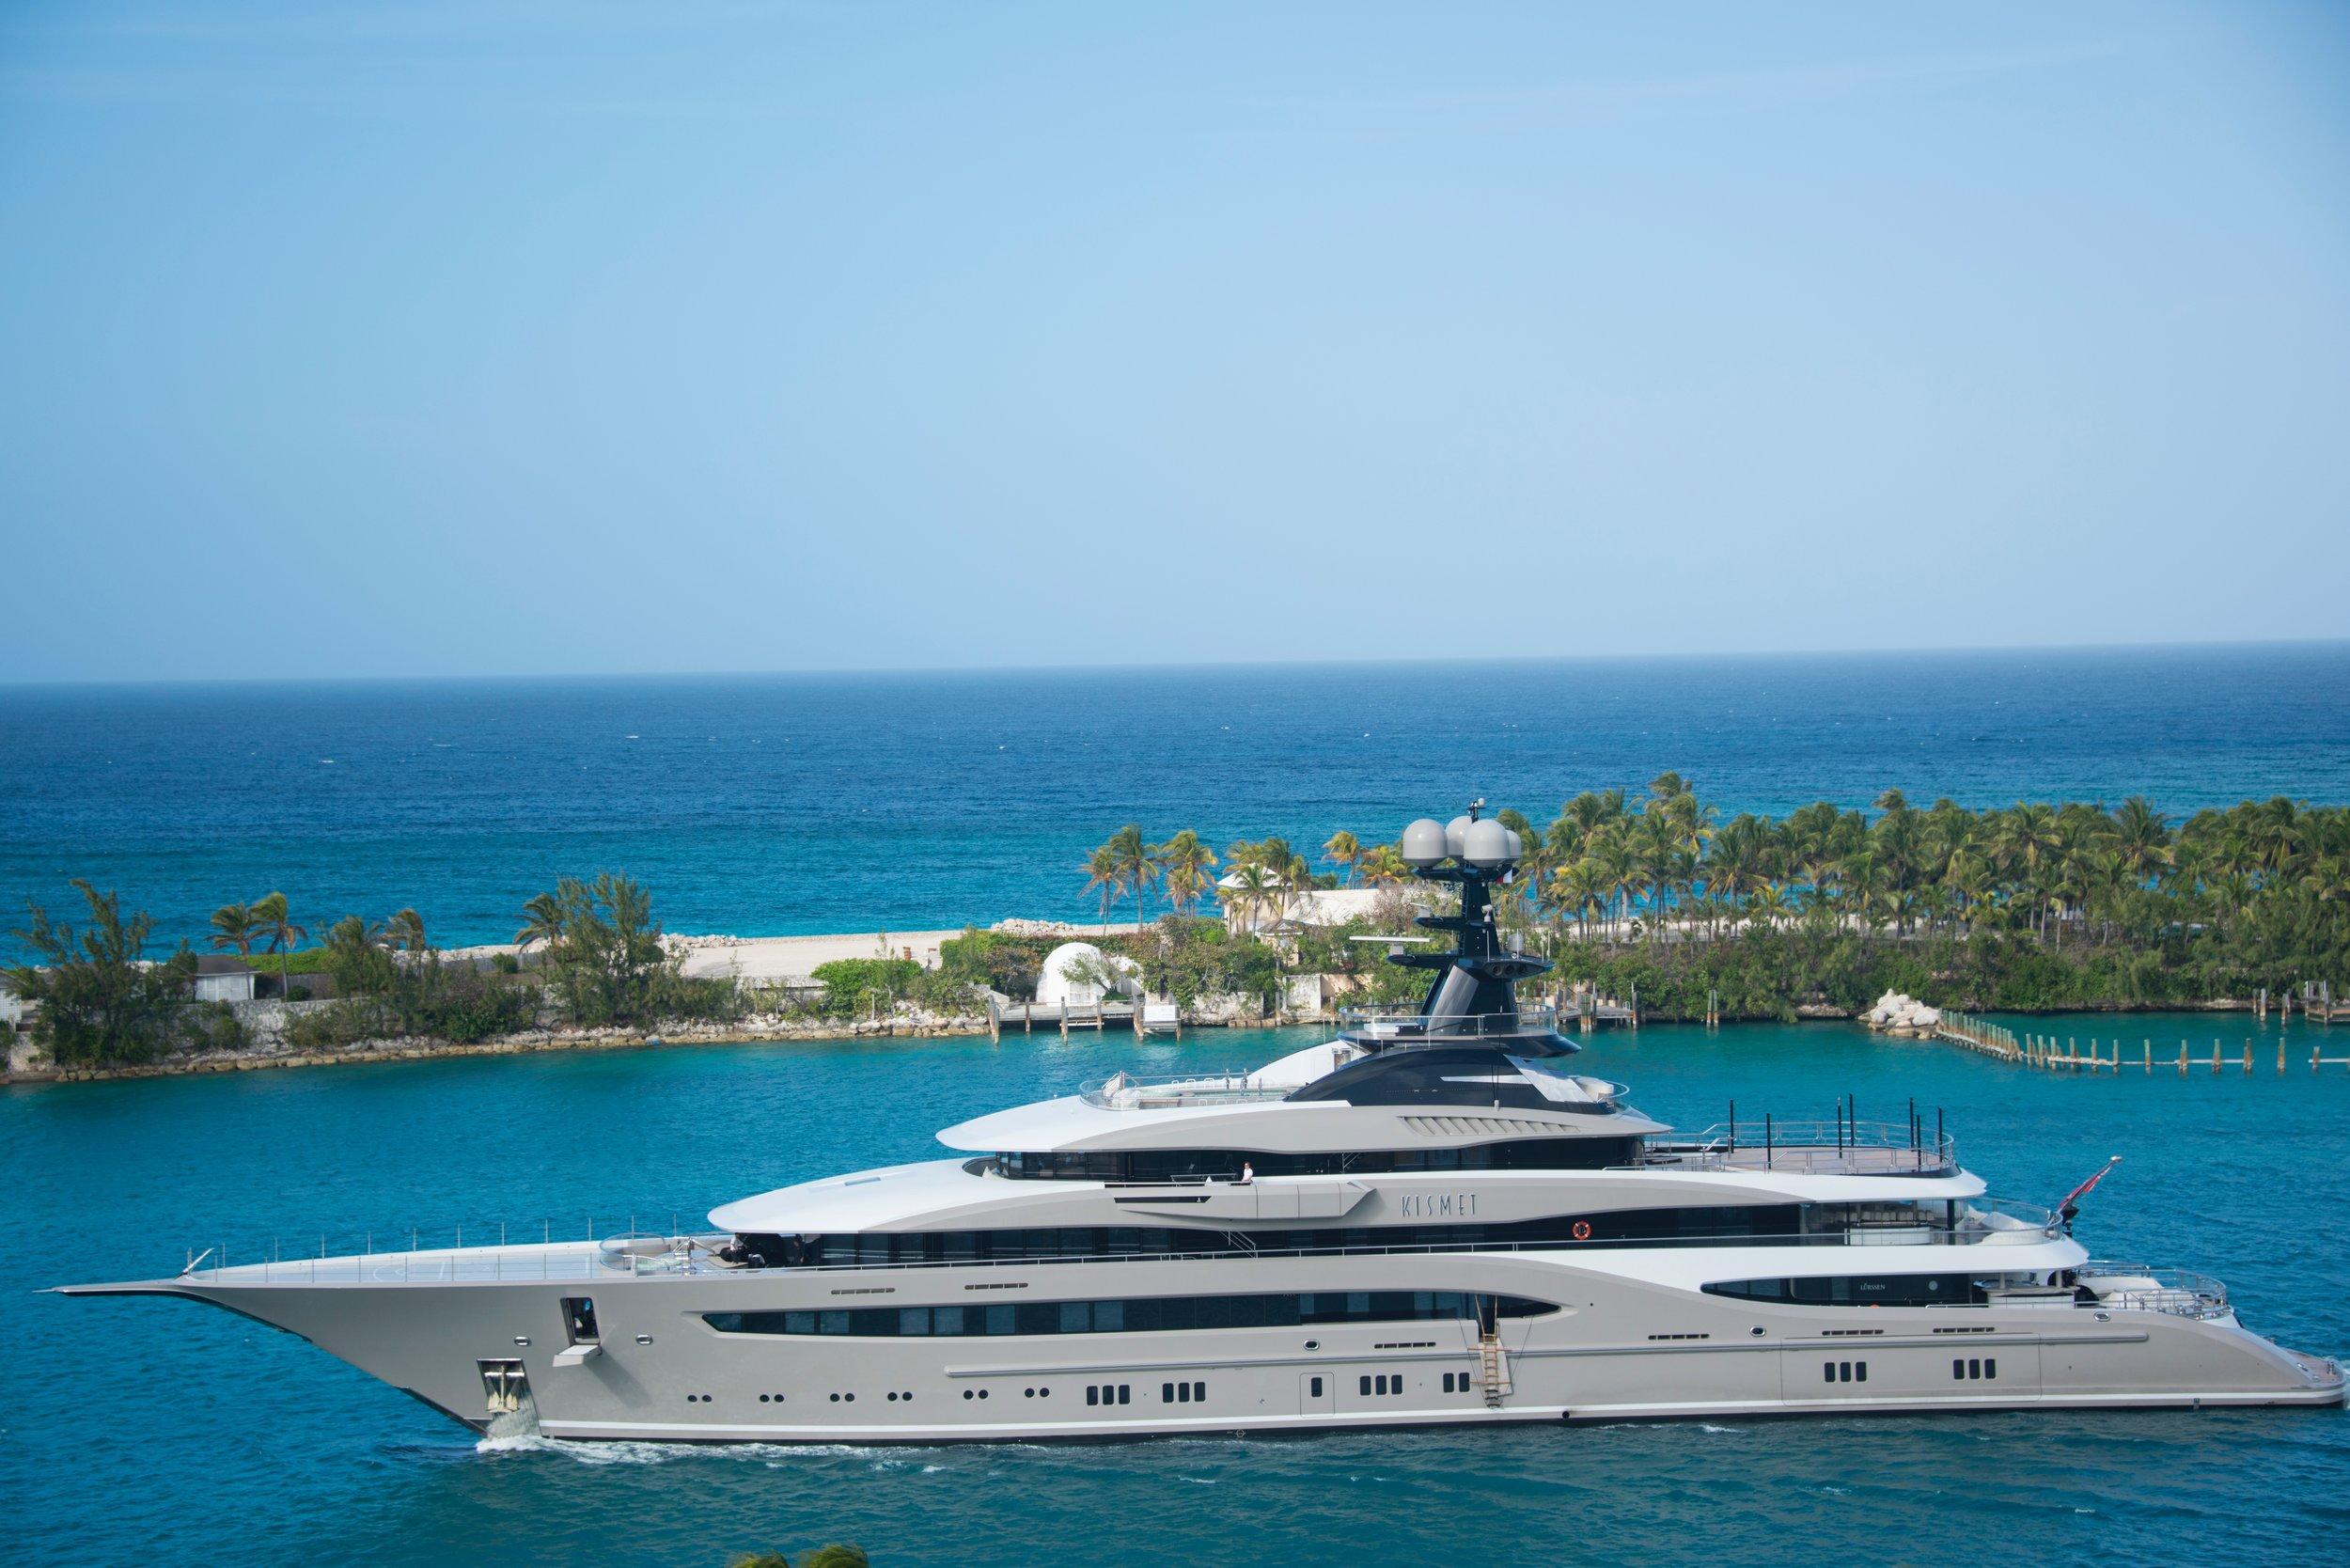 daytime-island-luxury-843633.jpg